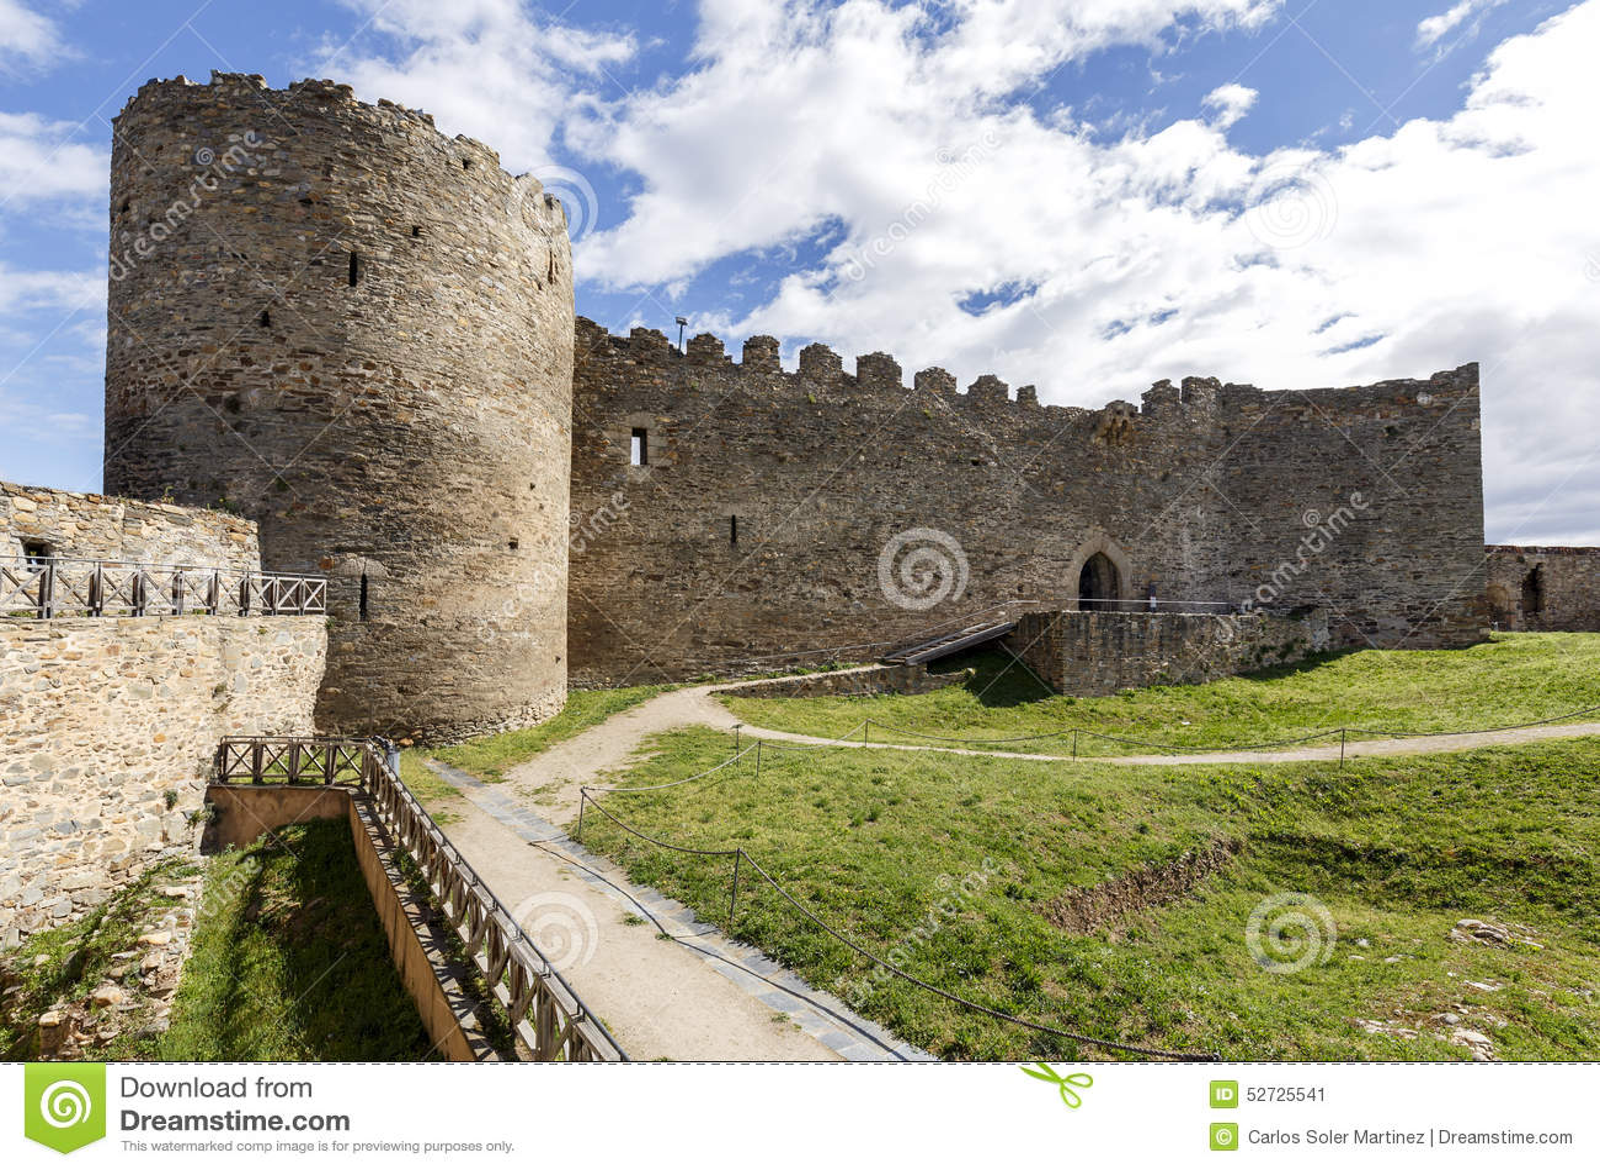 Ponferrada Spain  City pictures : Ancient castle of Ponferrada. Spain, the Bierzo, Spain.